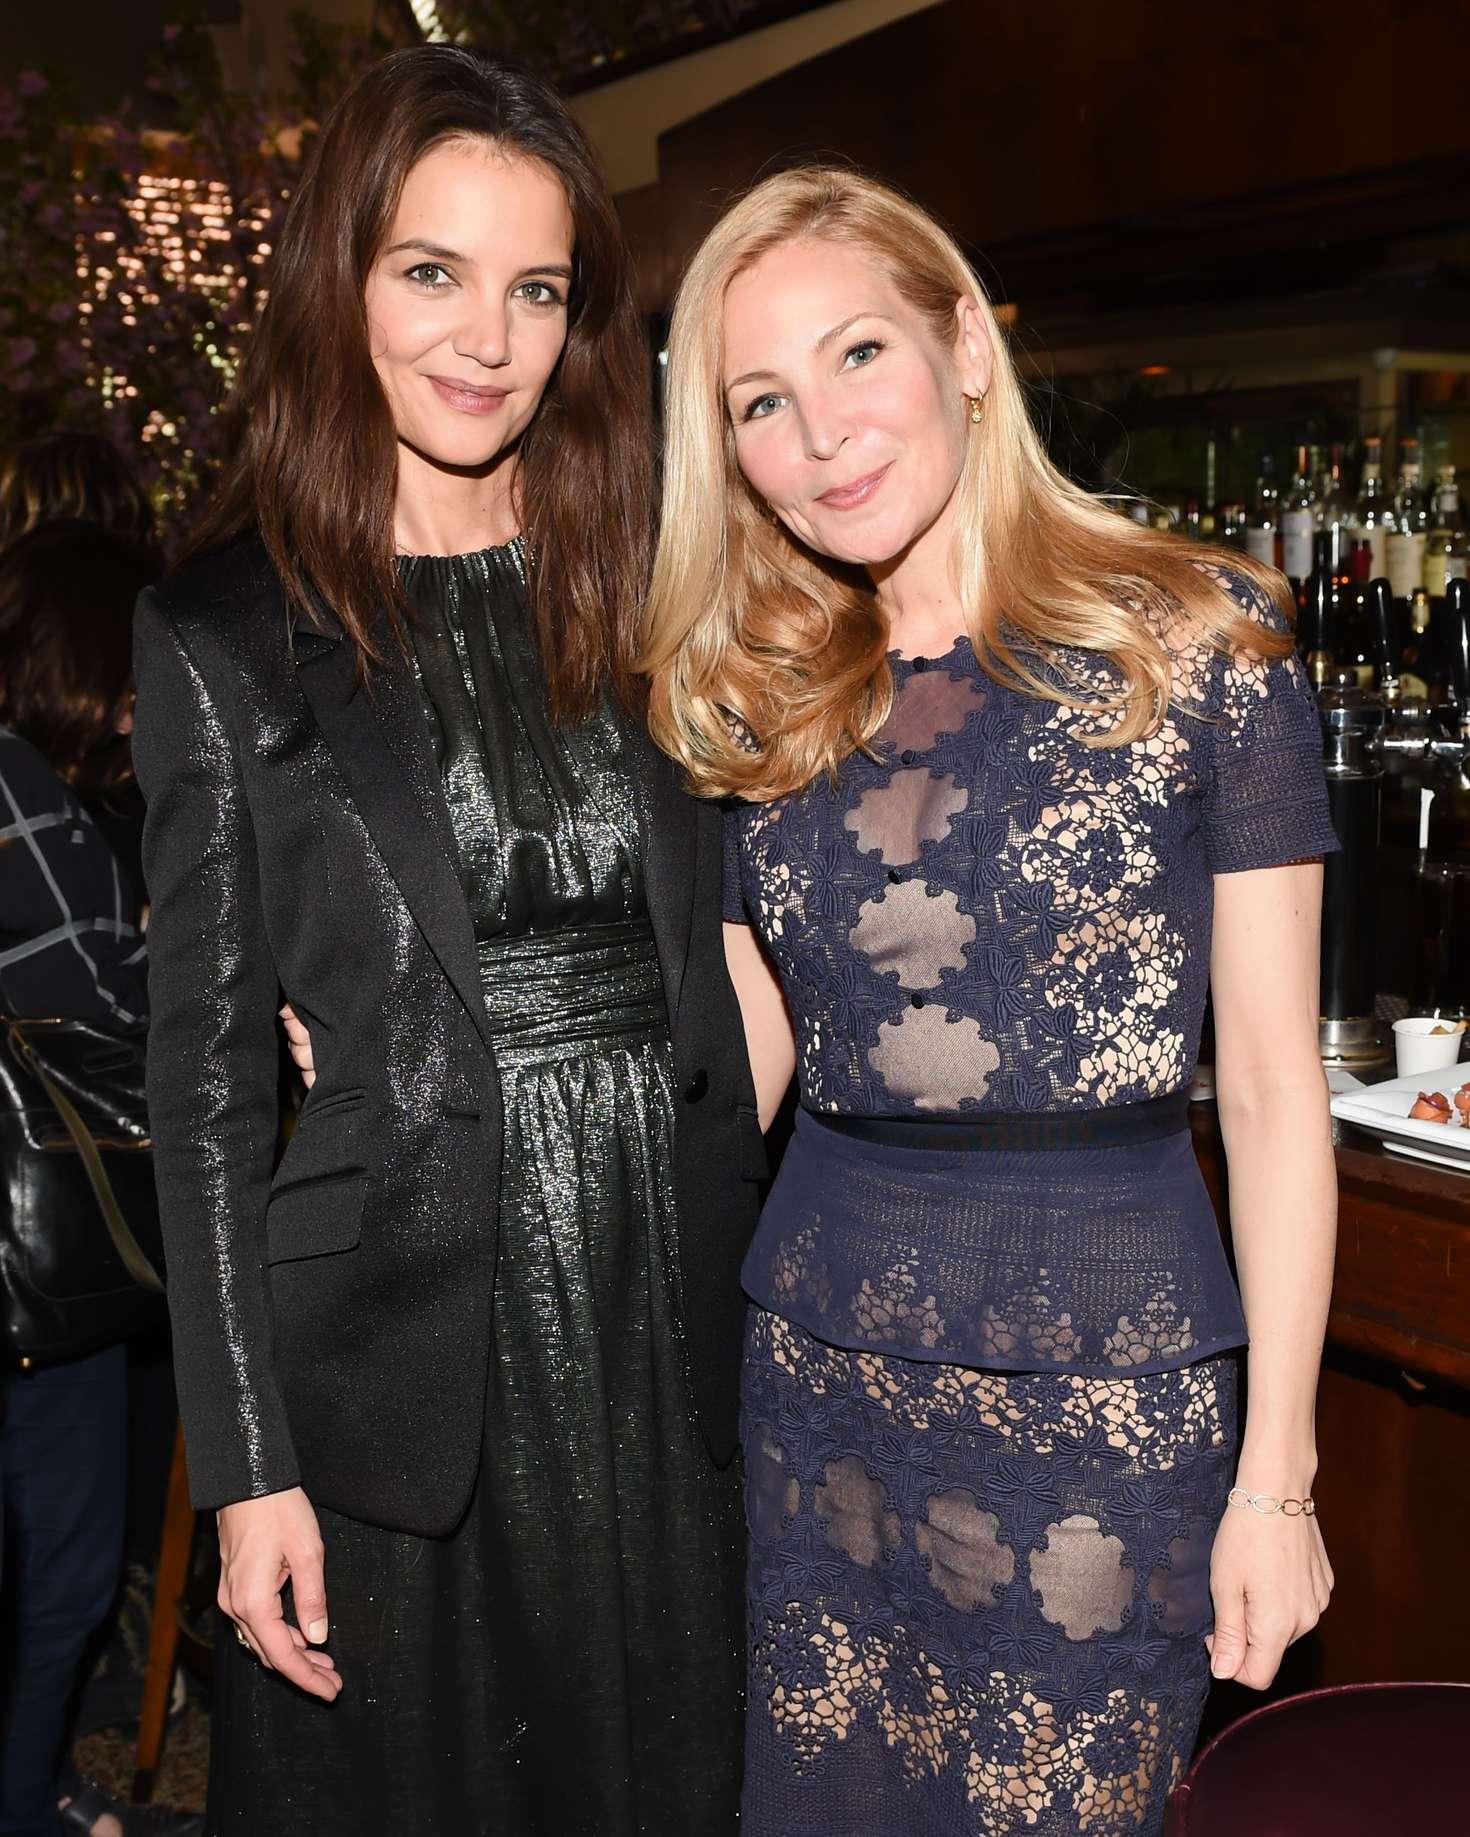 Katie Holmes 2016 : Katie Holmes: Women Filmmakers Luncheon at Tribeca Film Festival 2016 -09